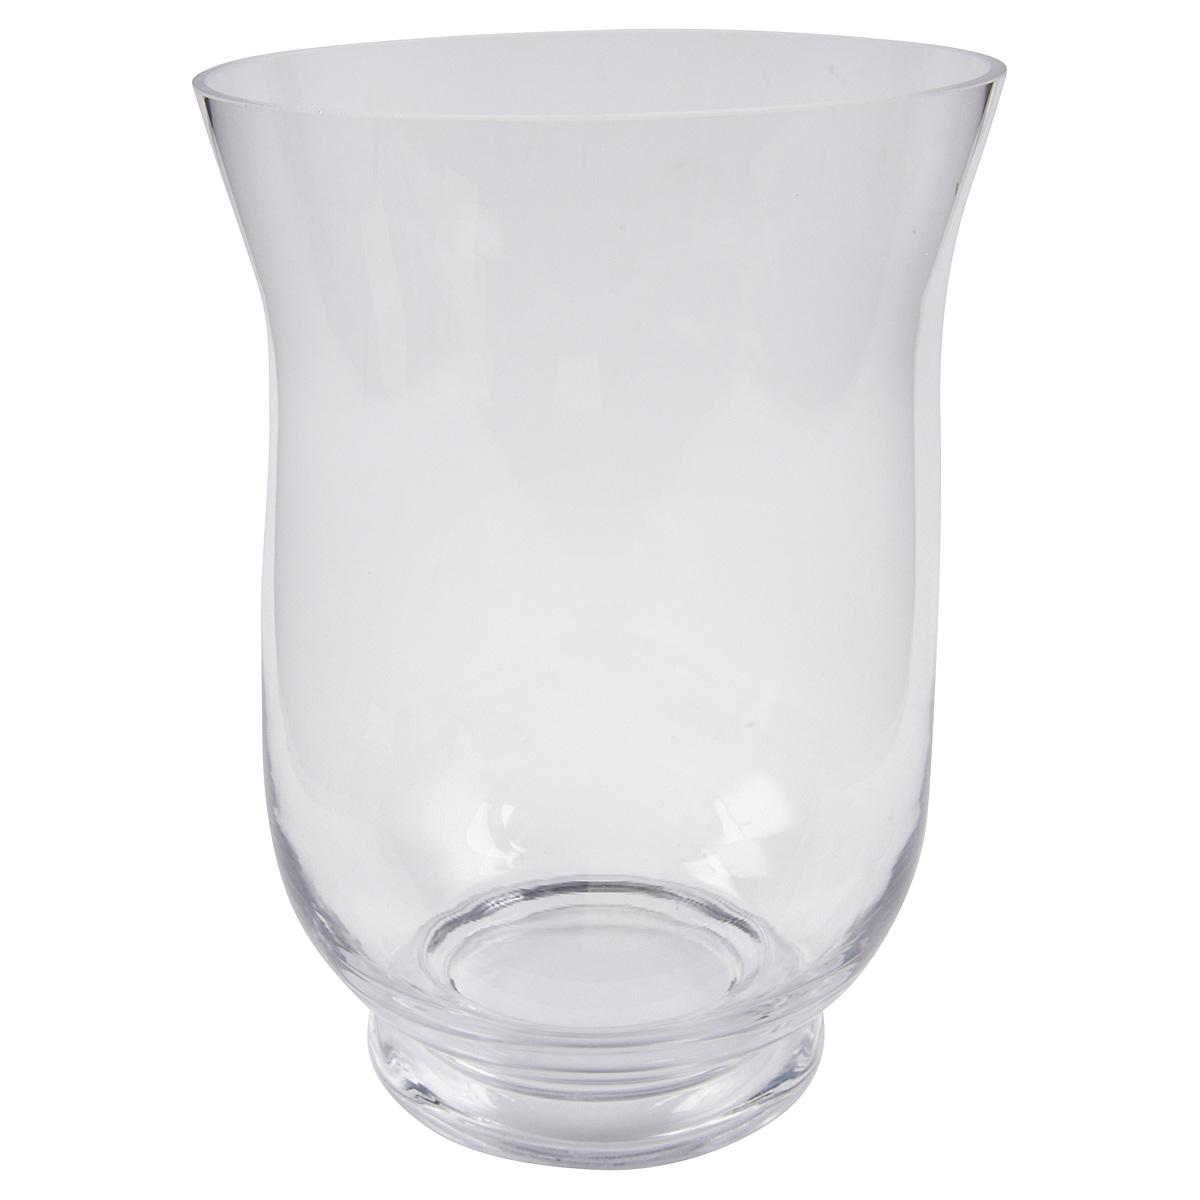 Glass Hurricane Candle Holder Www Pixshark Com Images